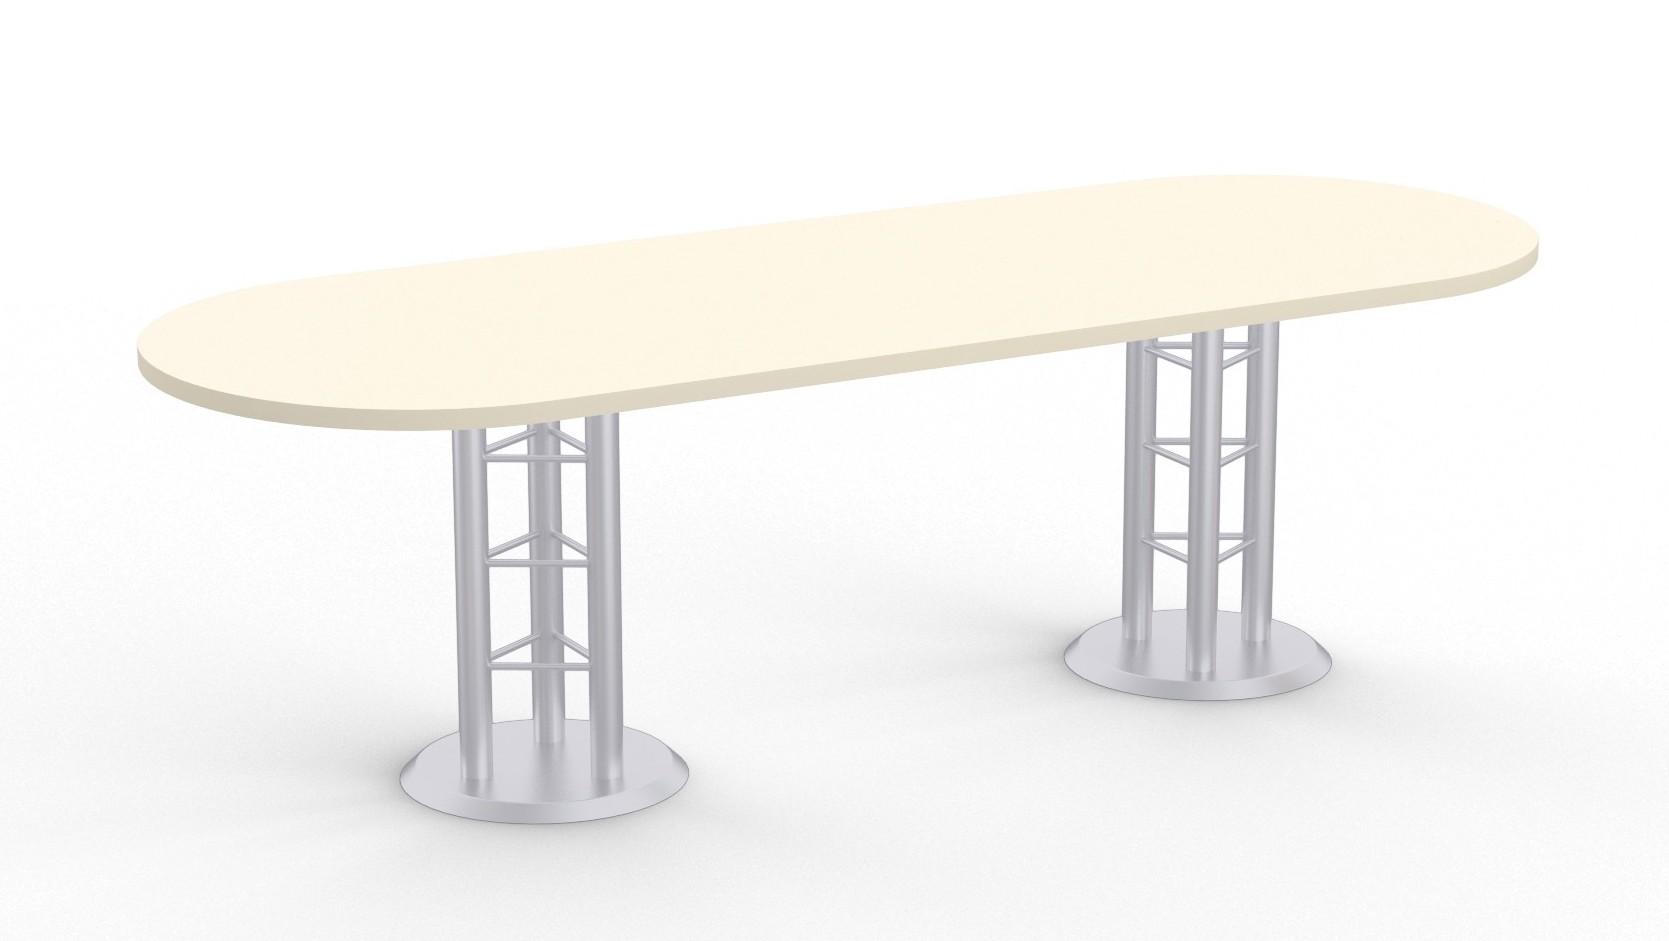 atlantis racetrack conference table - antique white